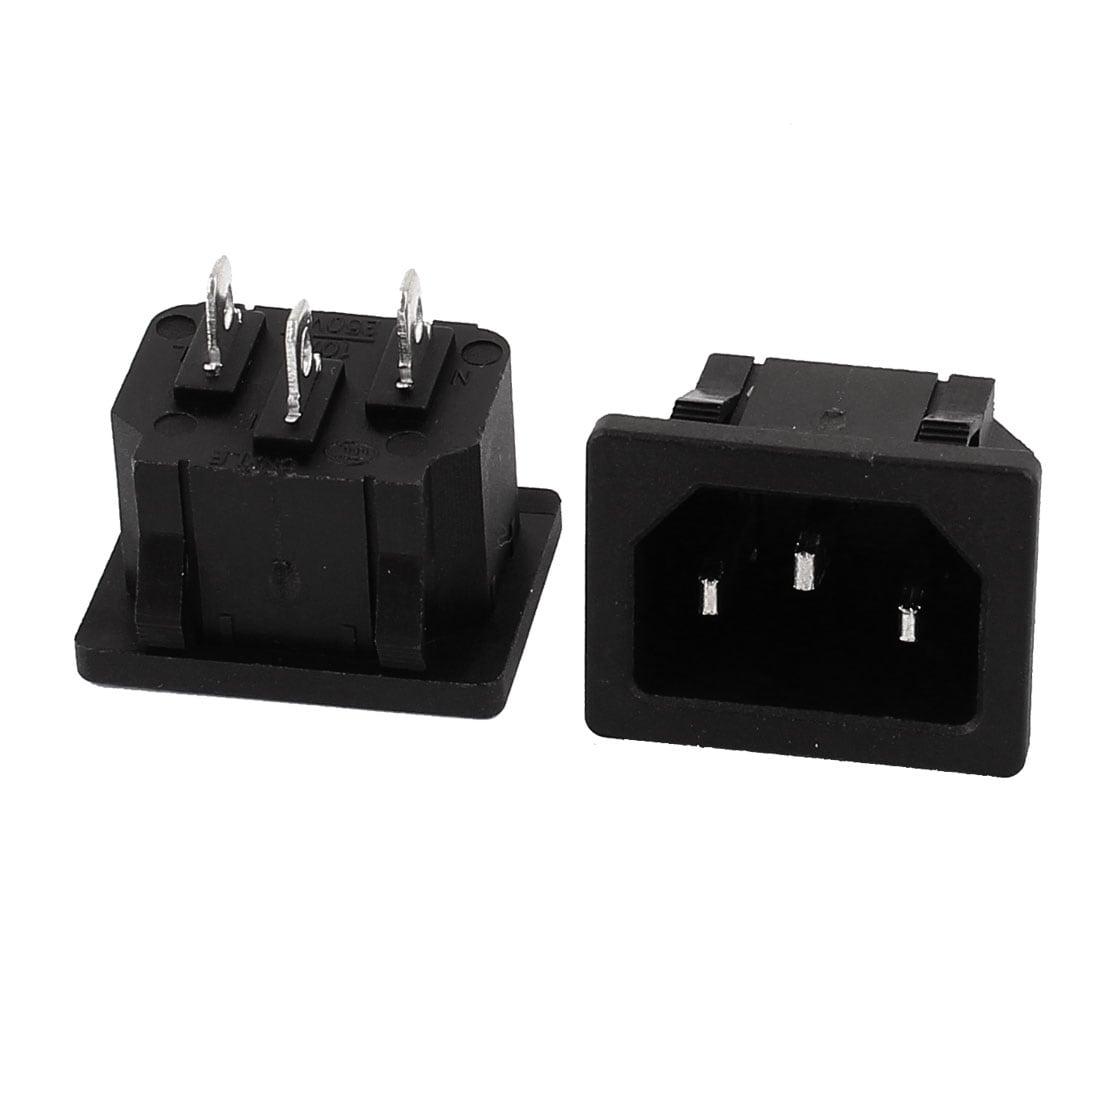 5 Pcs AC 250V 10A 3P IEC 320 C14 Plug Panel Mount Power Inlet Sockets Receptacle